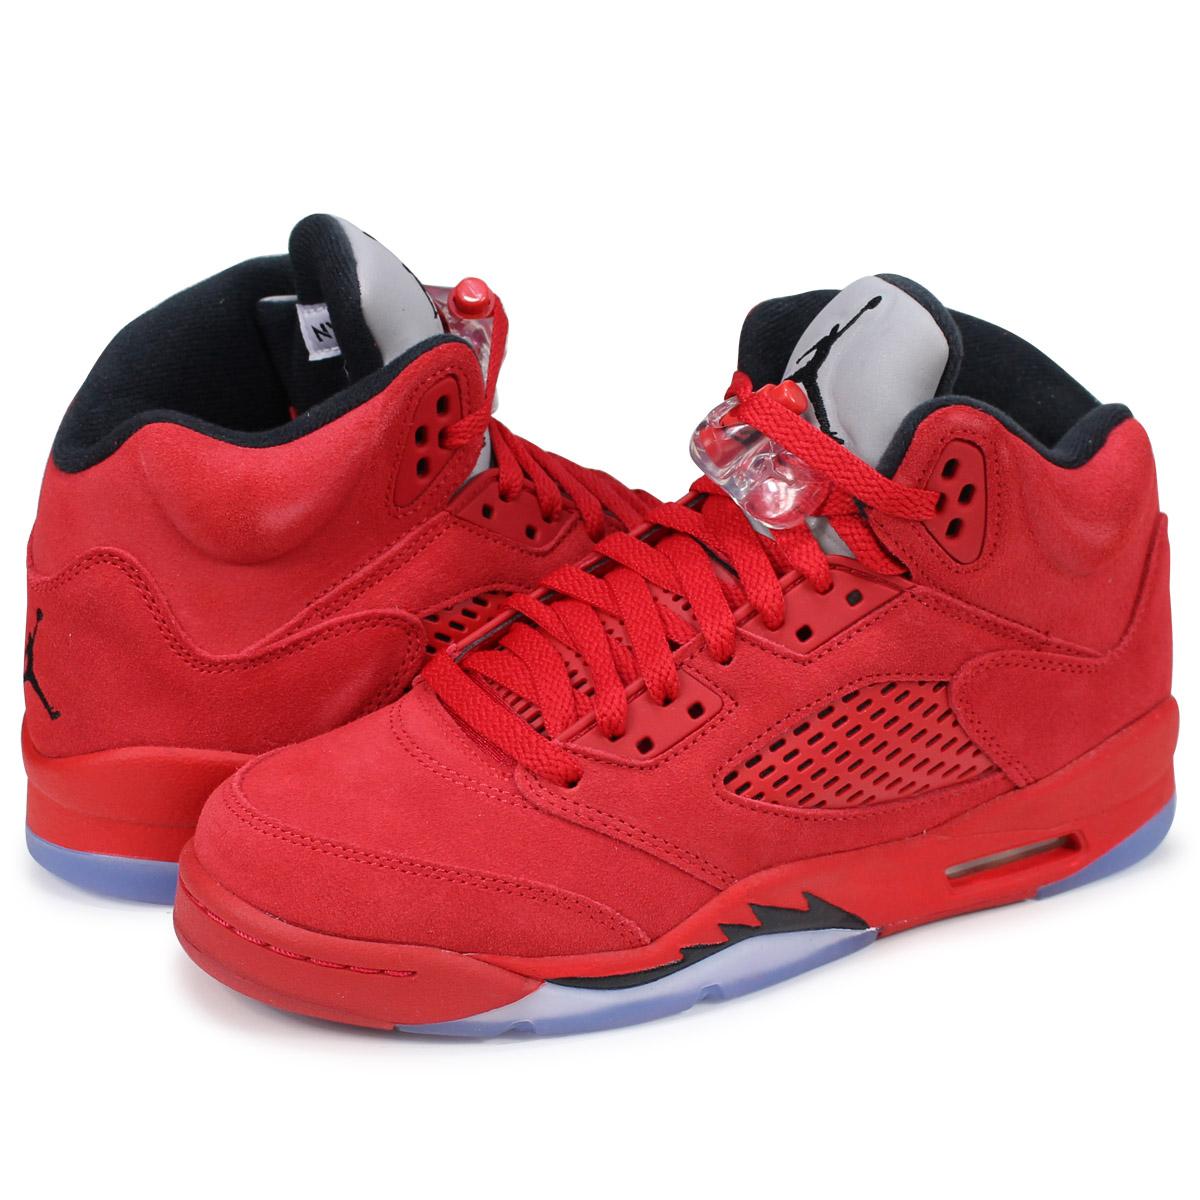 sports shoes 7f85f 28443 NIKE AIR JORDAN 5 RETRO BG Nike Air Jordan 5 nostalgic lady's sneakers  440,888-602 ...